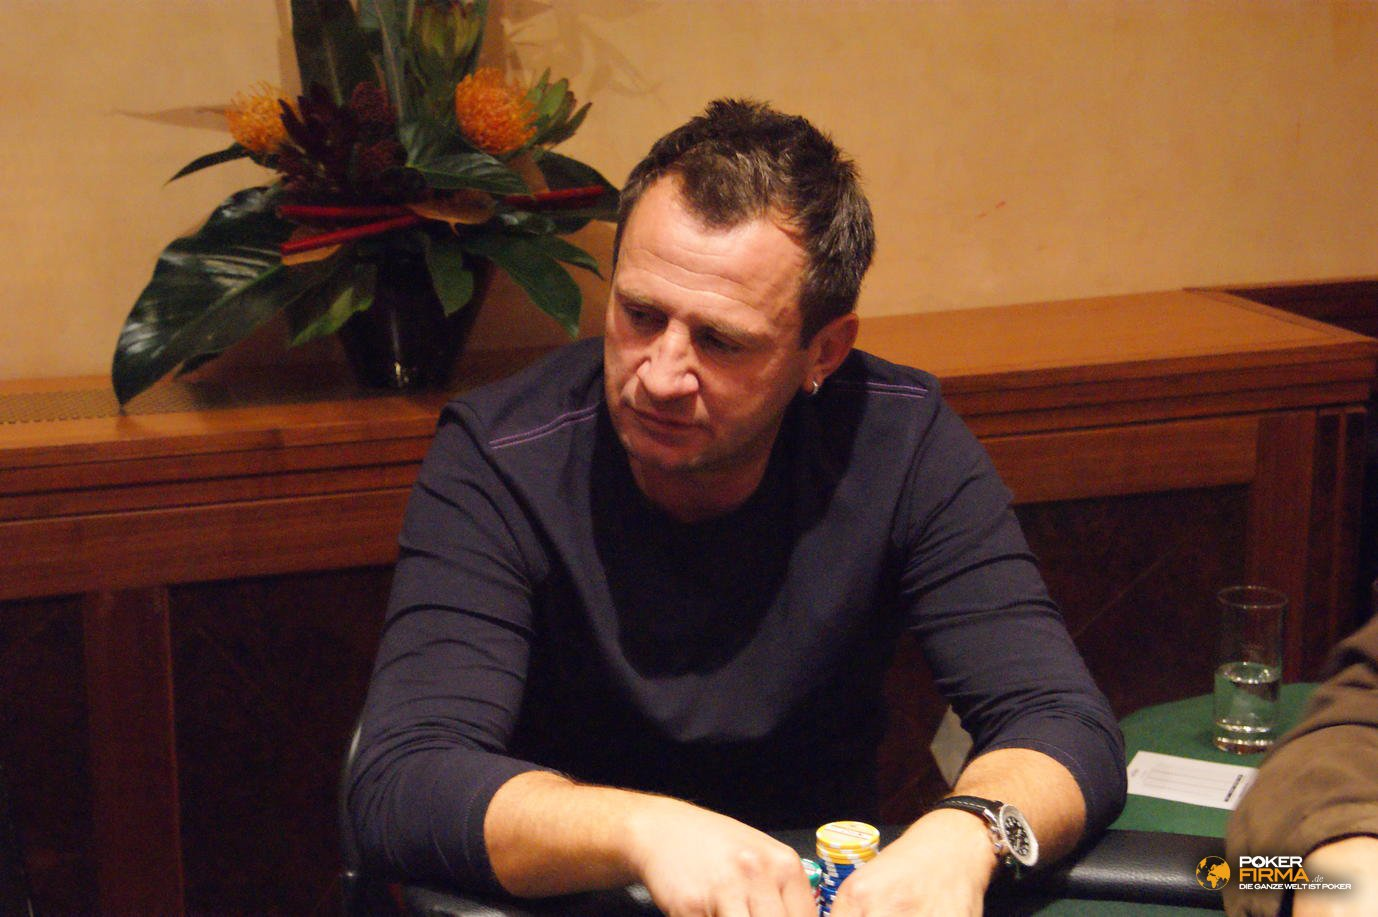 Poker_EM_2000_NLH_251011_Nenad_Markovic